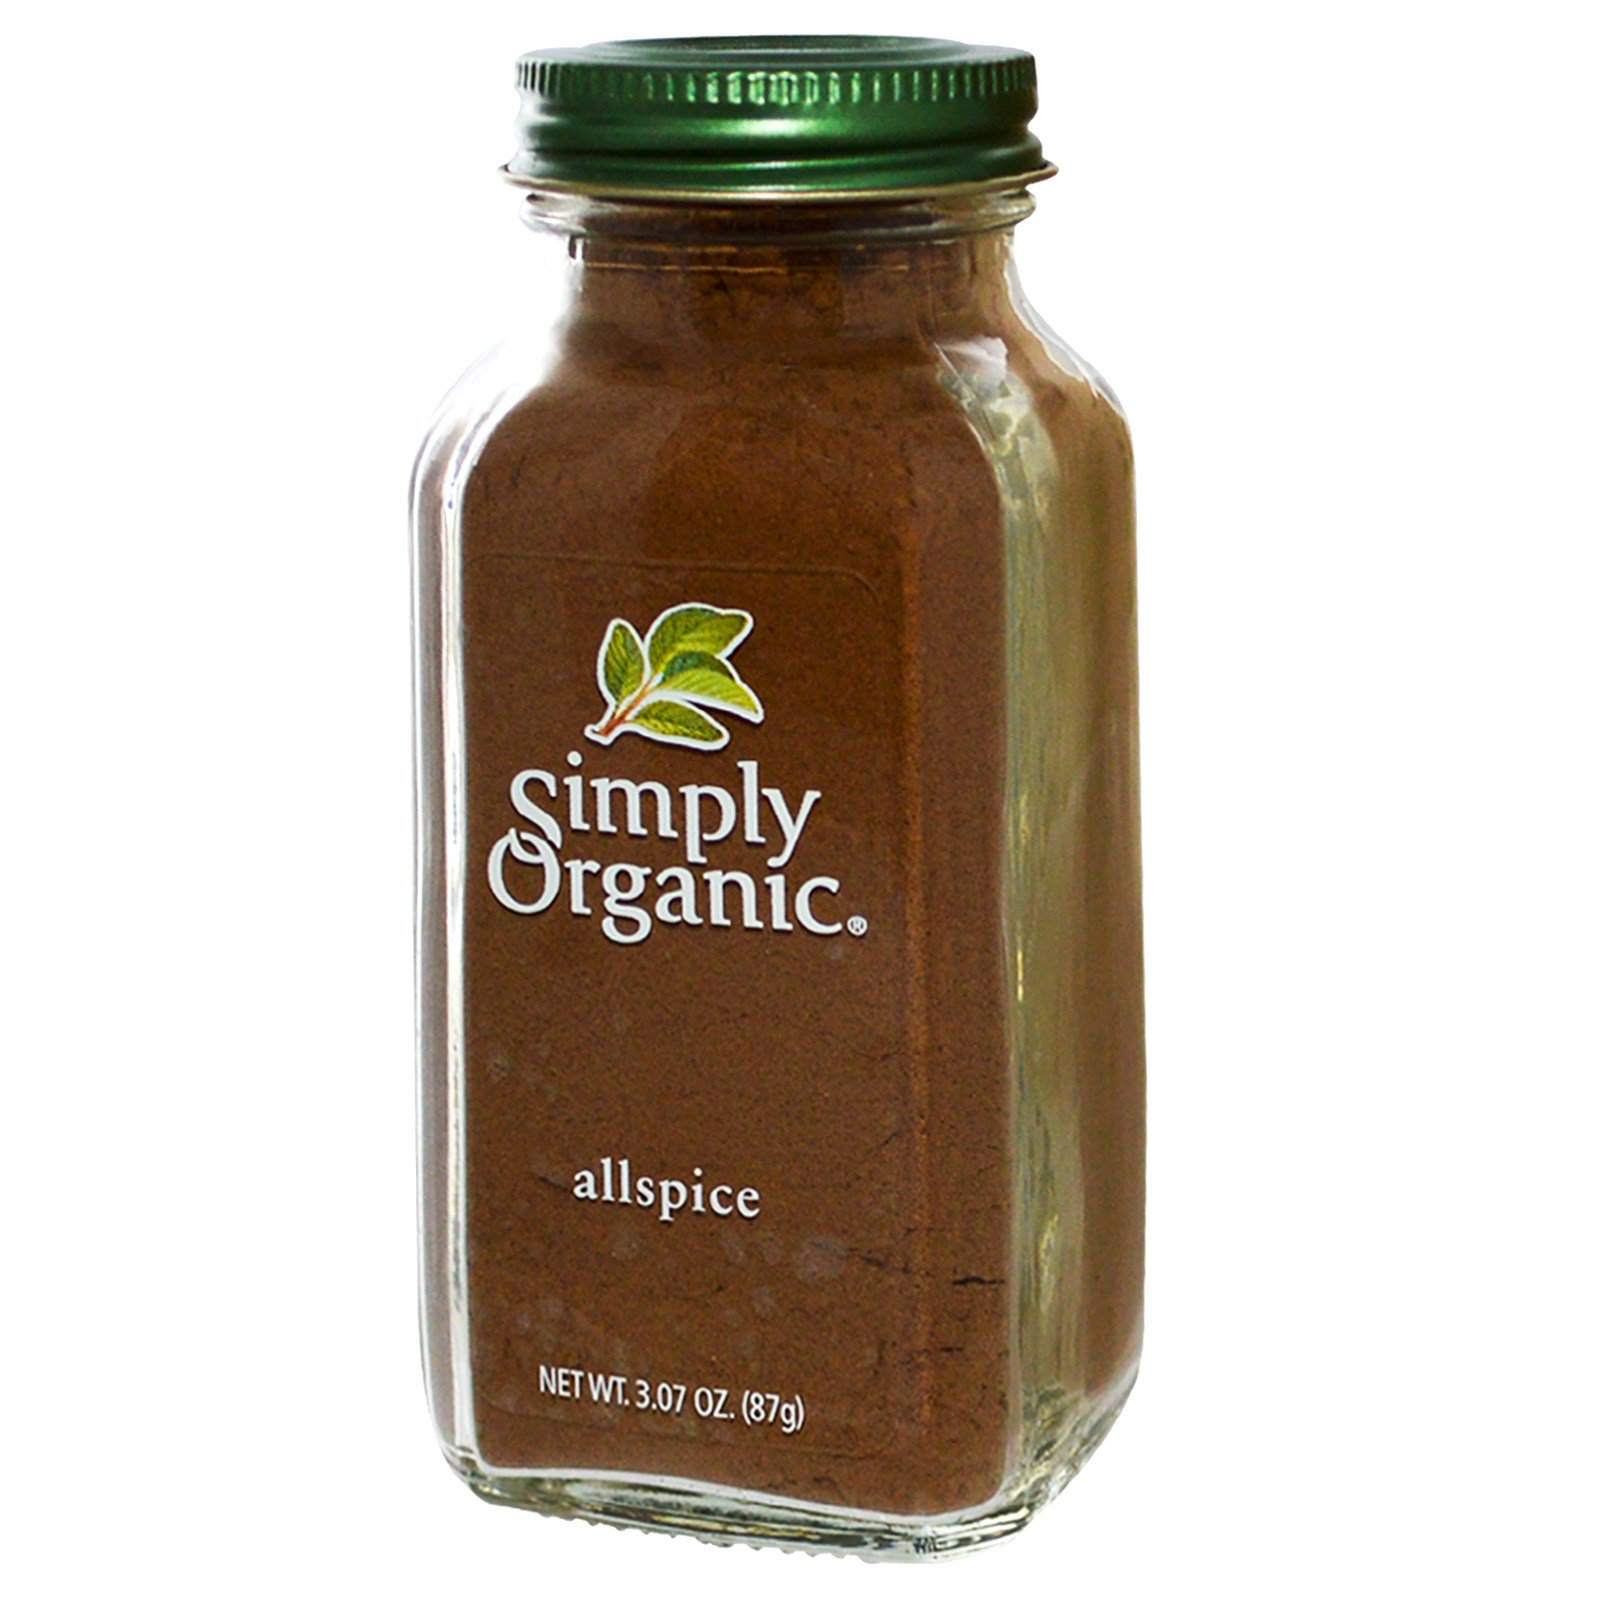 Simply Organic, Душистый перец, 3,07 унции (87 г)